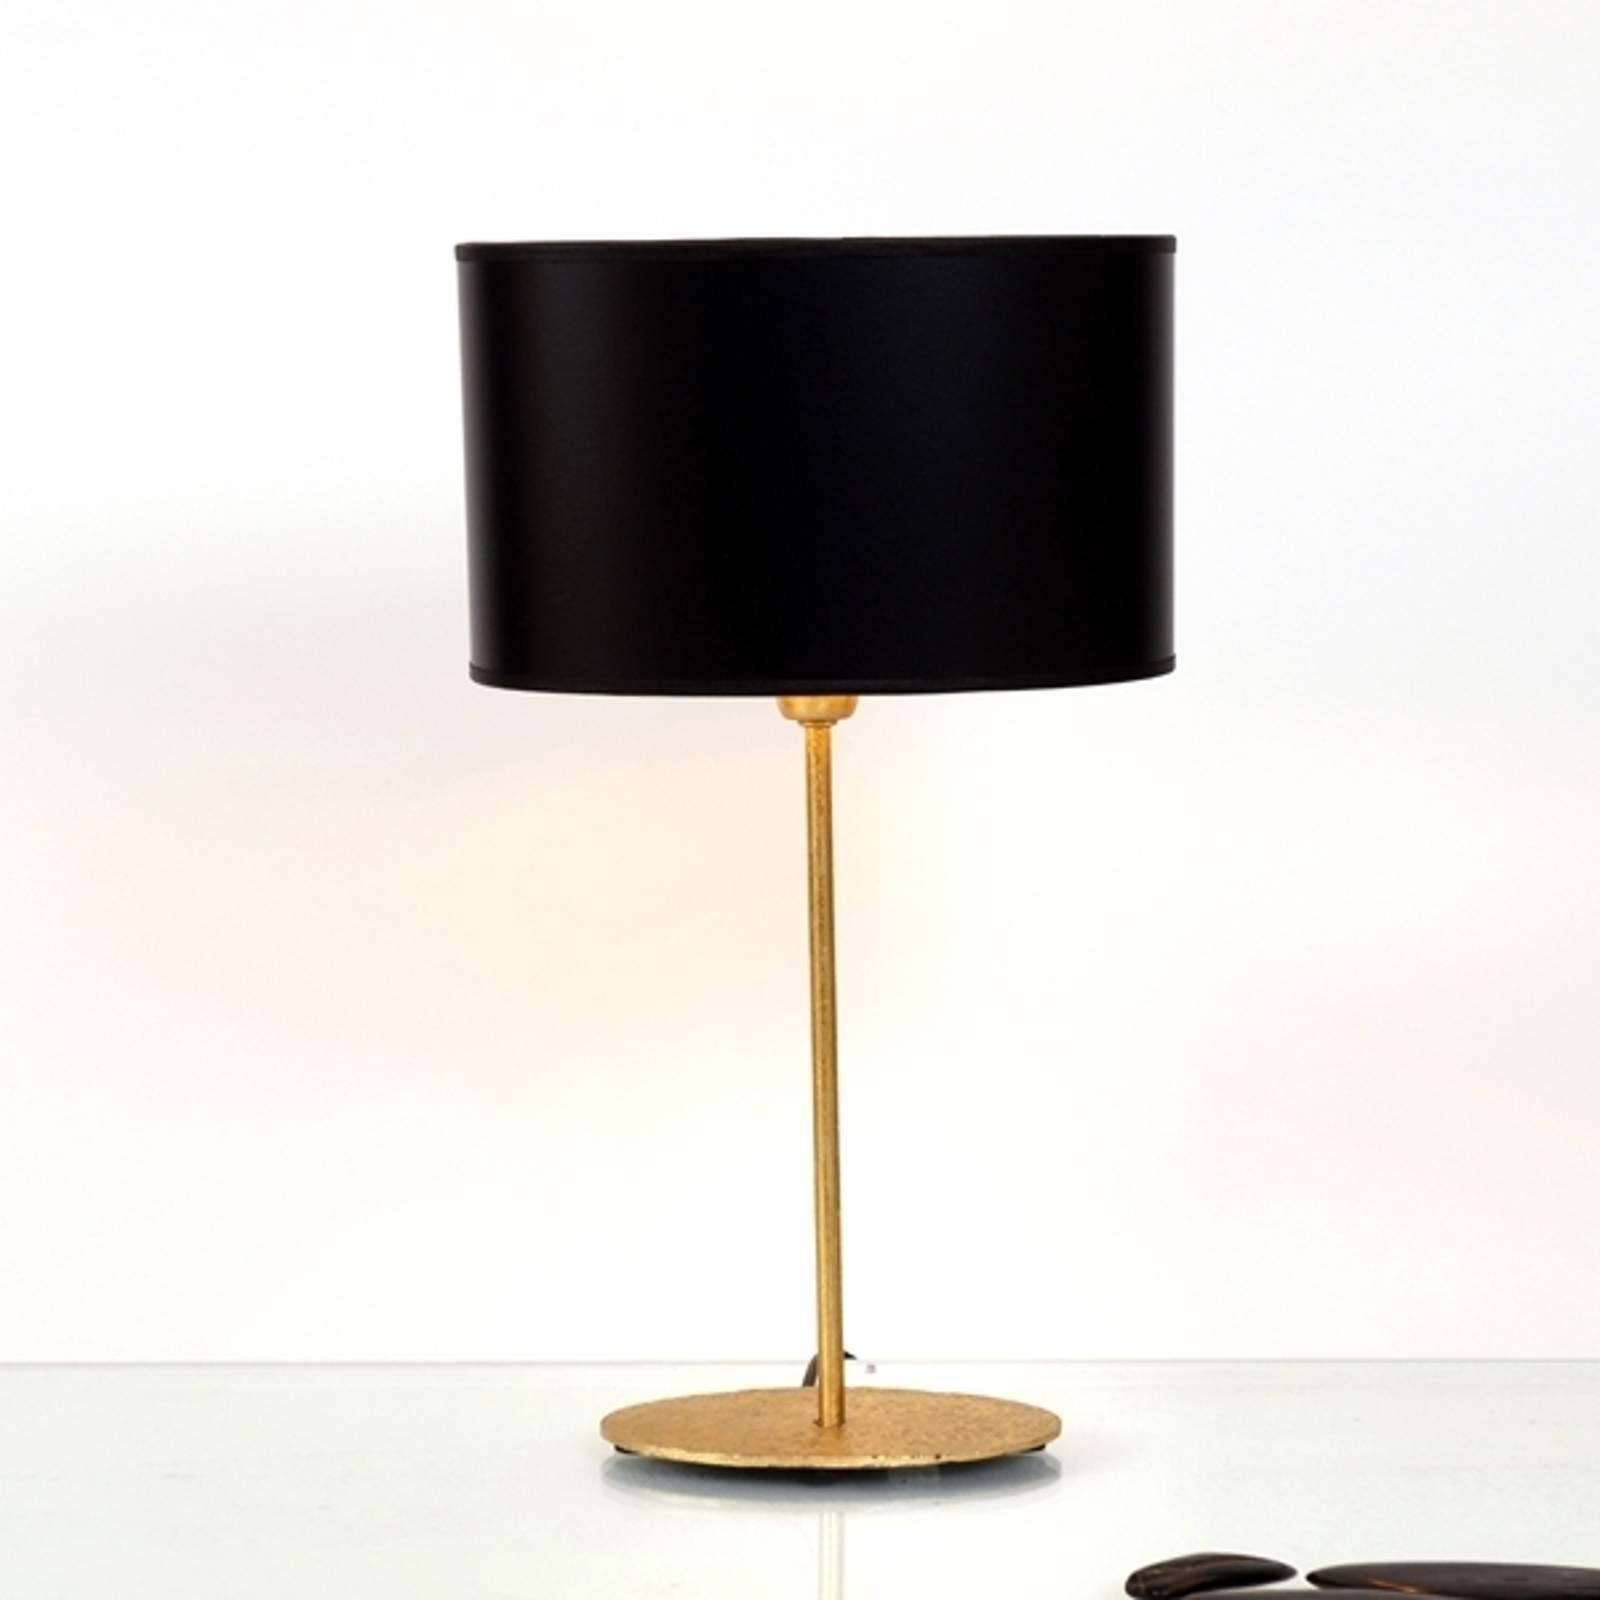 Mooie tafellamp Mattia met ovale kap